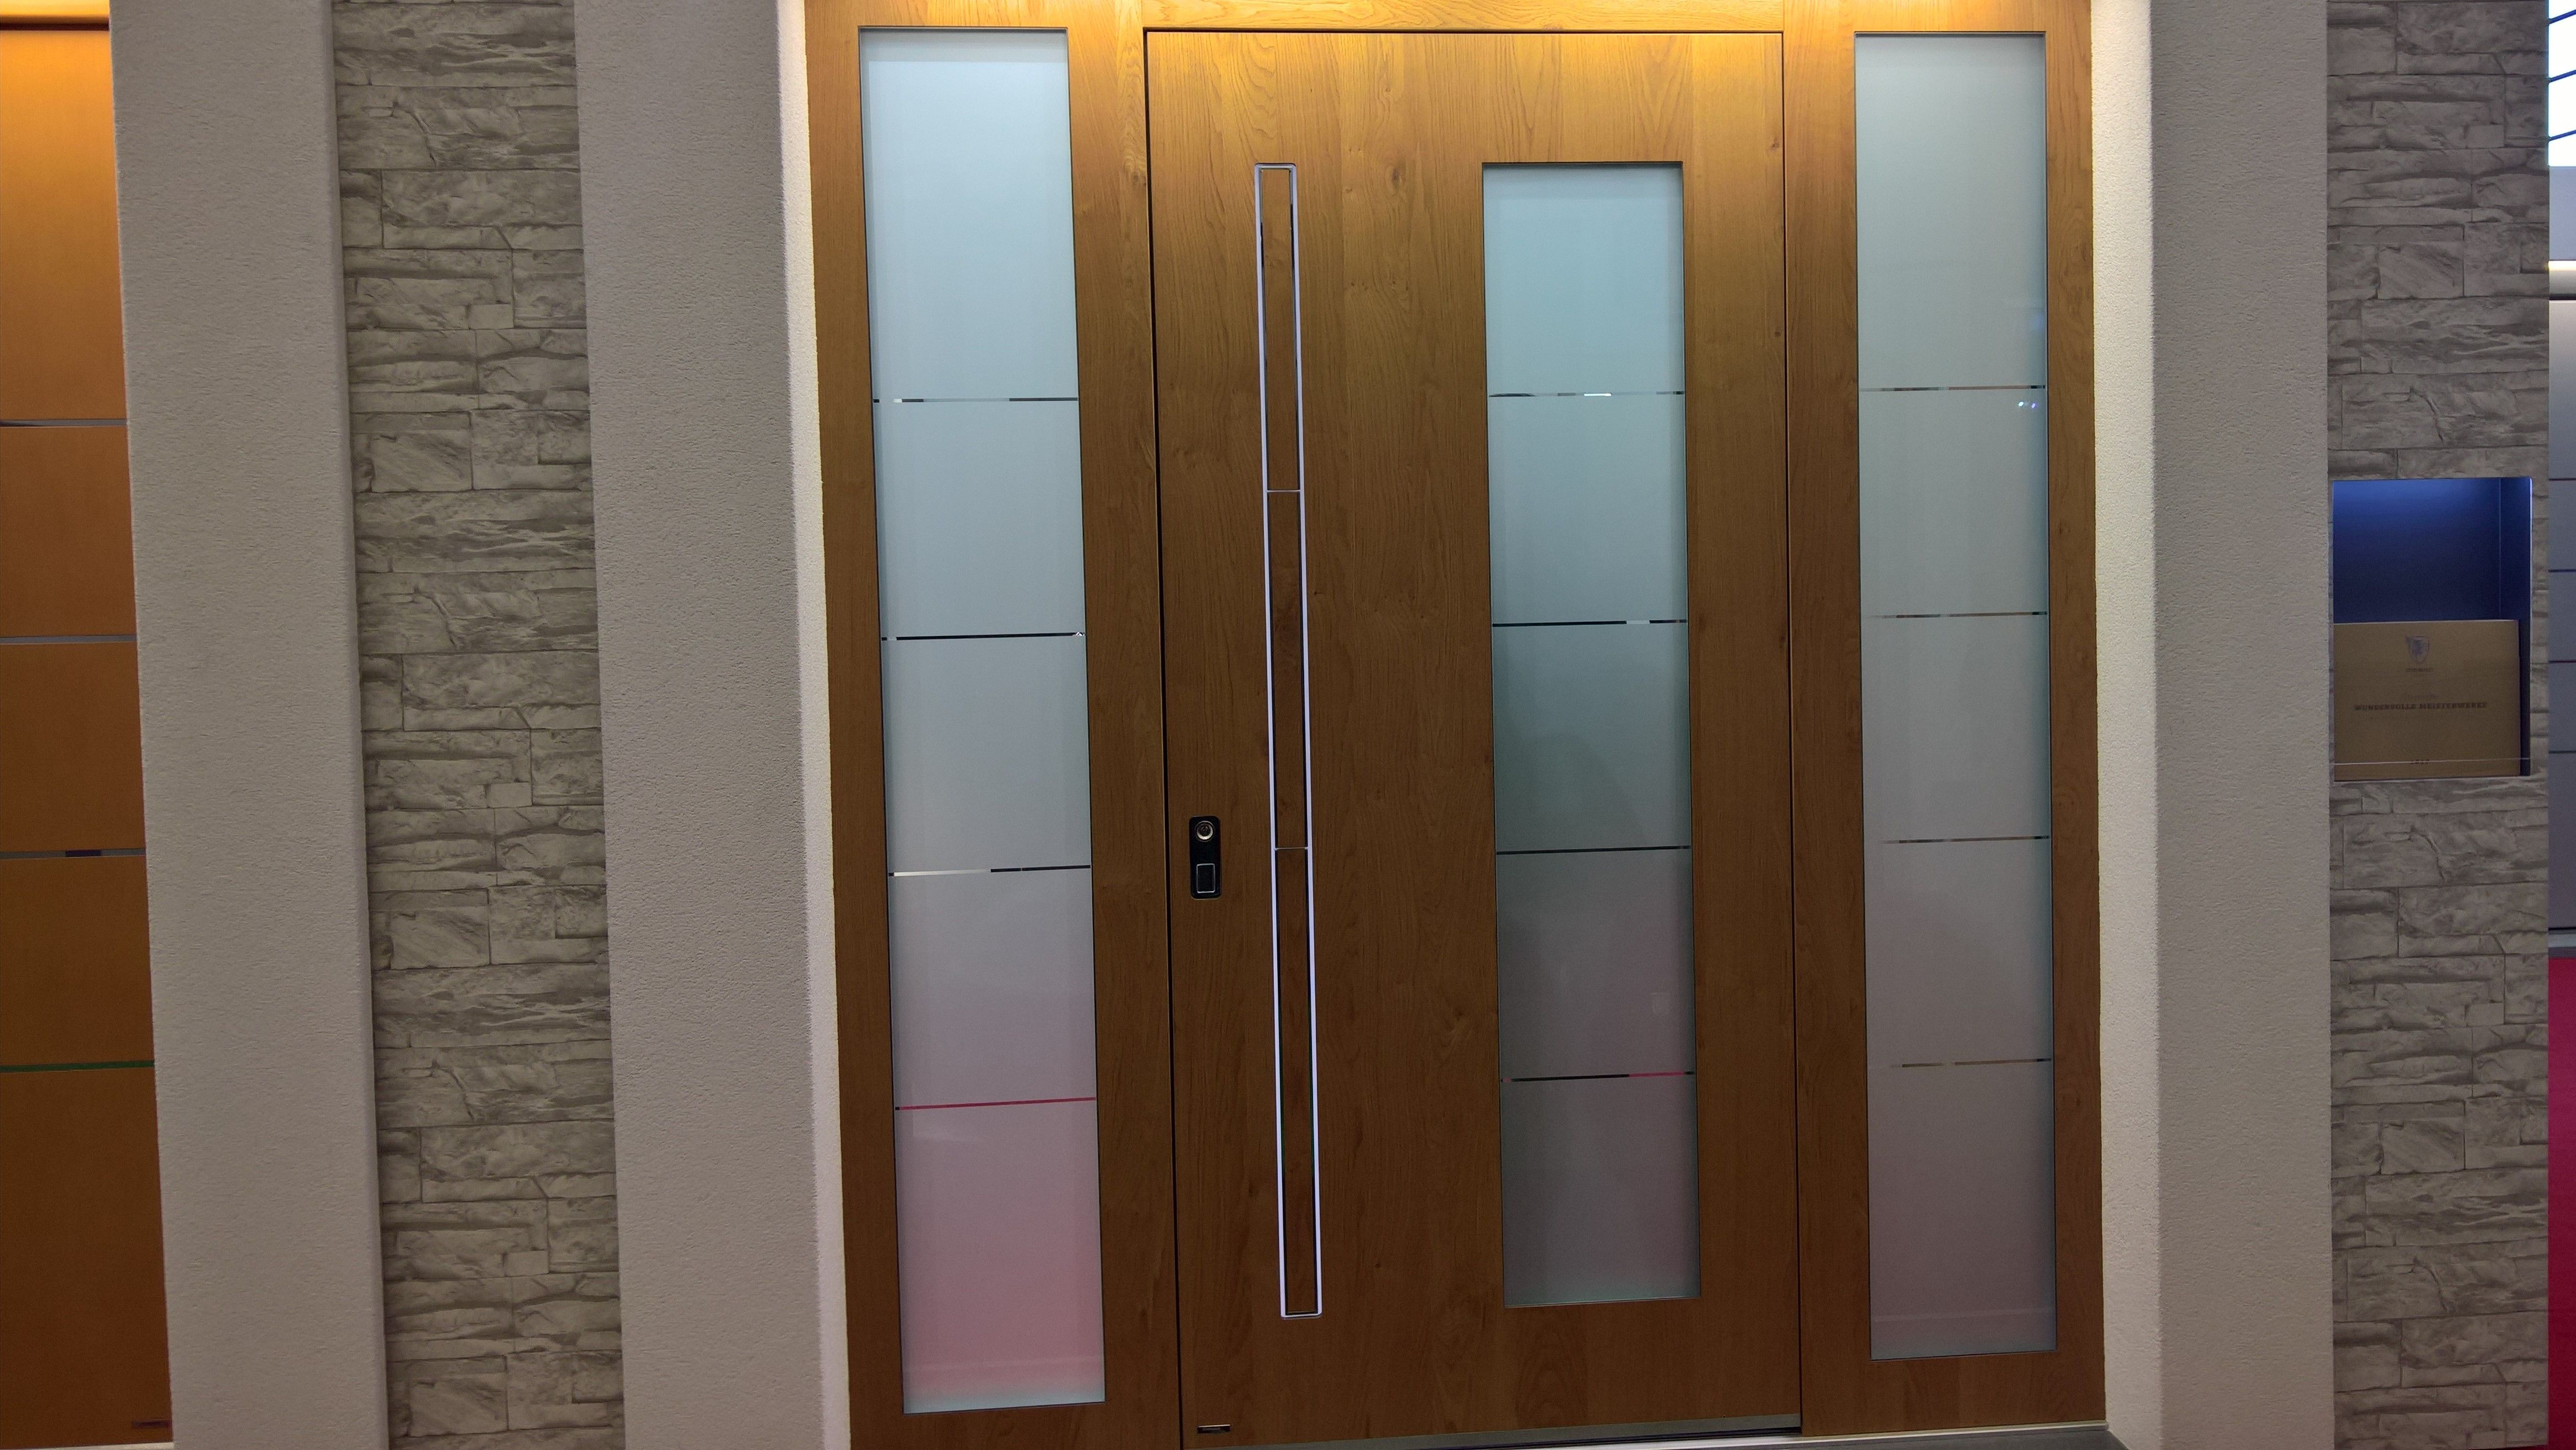 Badezimmerdesigns 8 x 6 pin by vaba gmbh haustürenmarkisedächer on pirnar haustüren